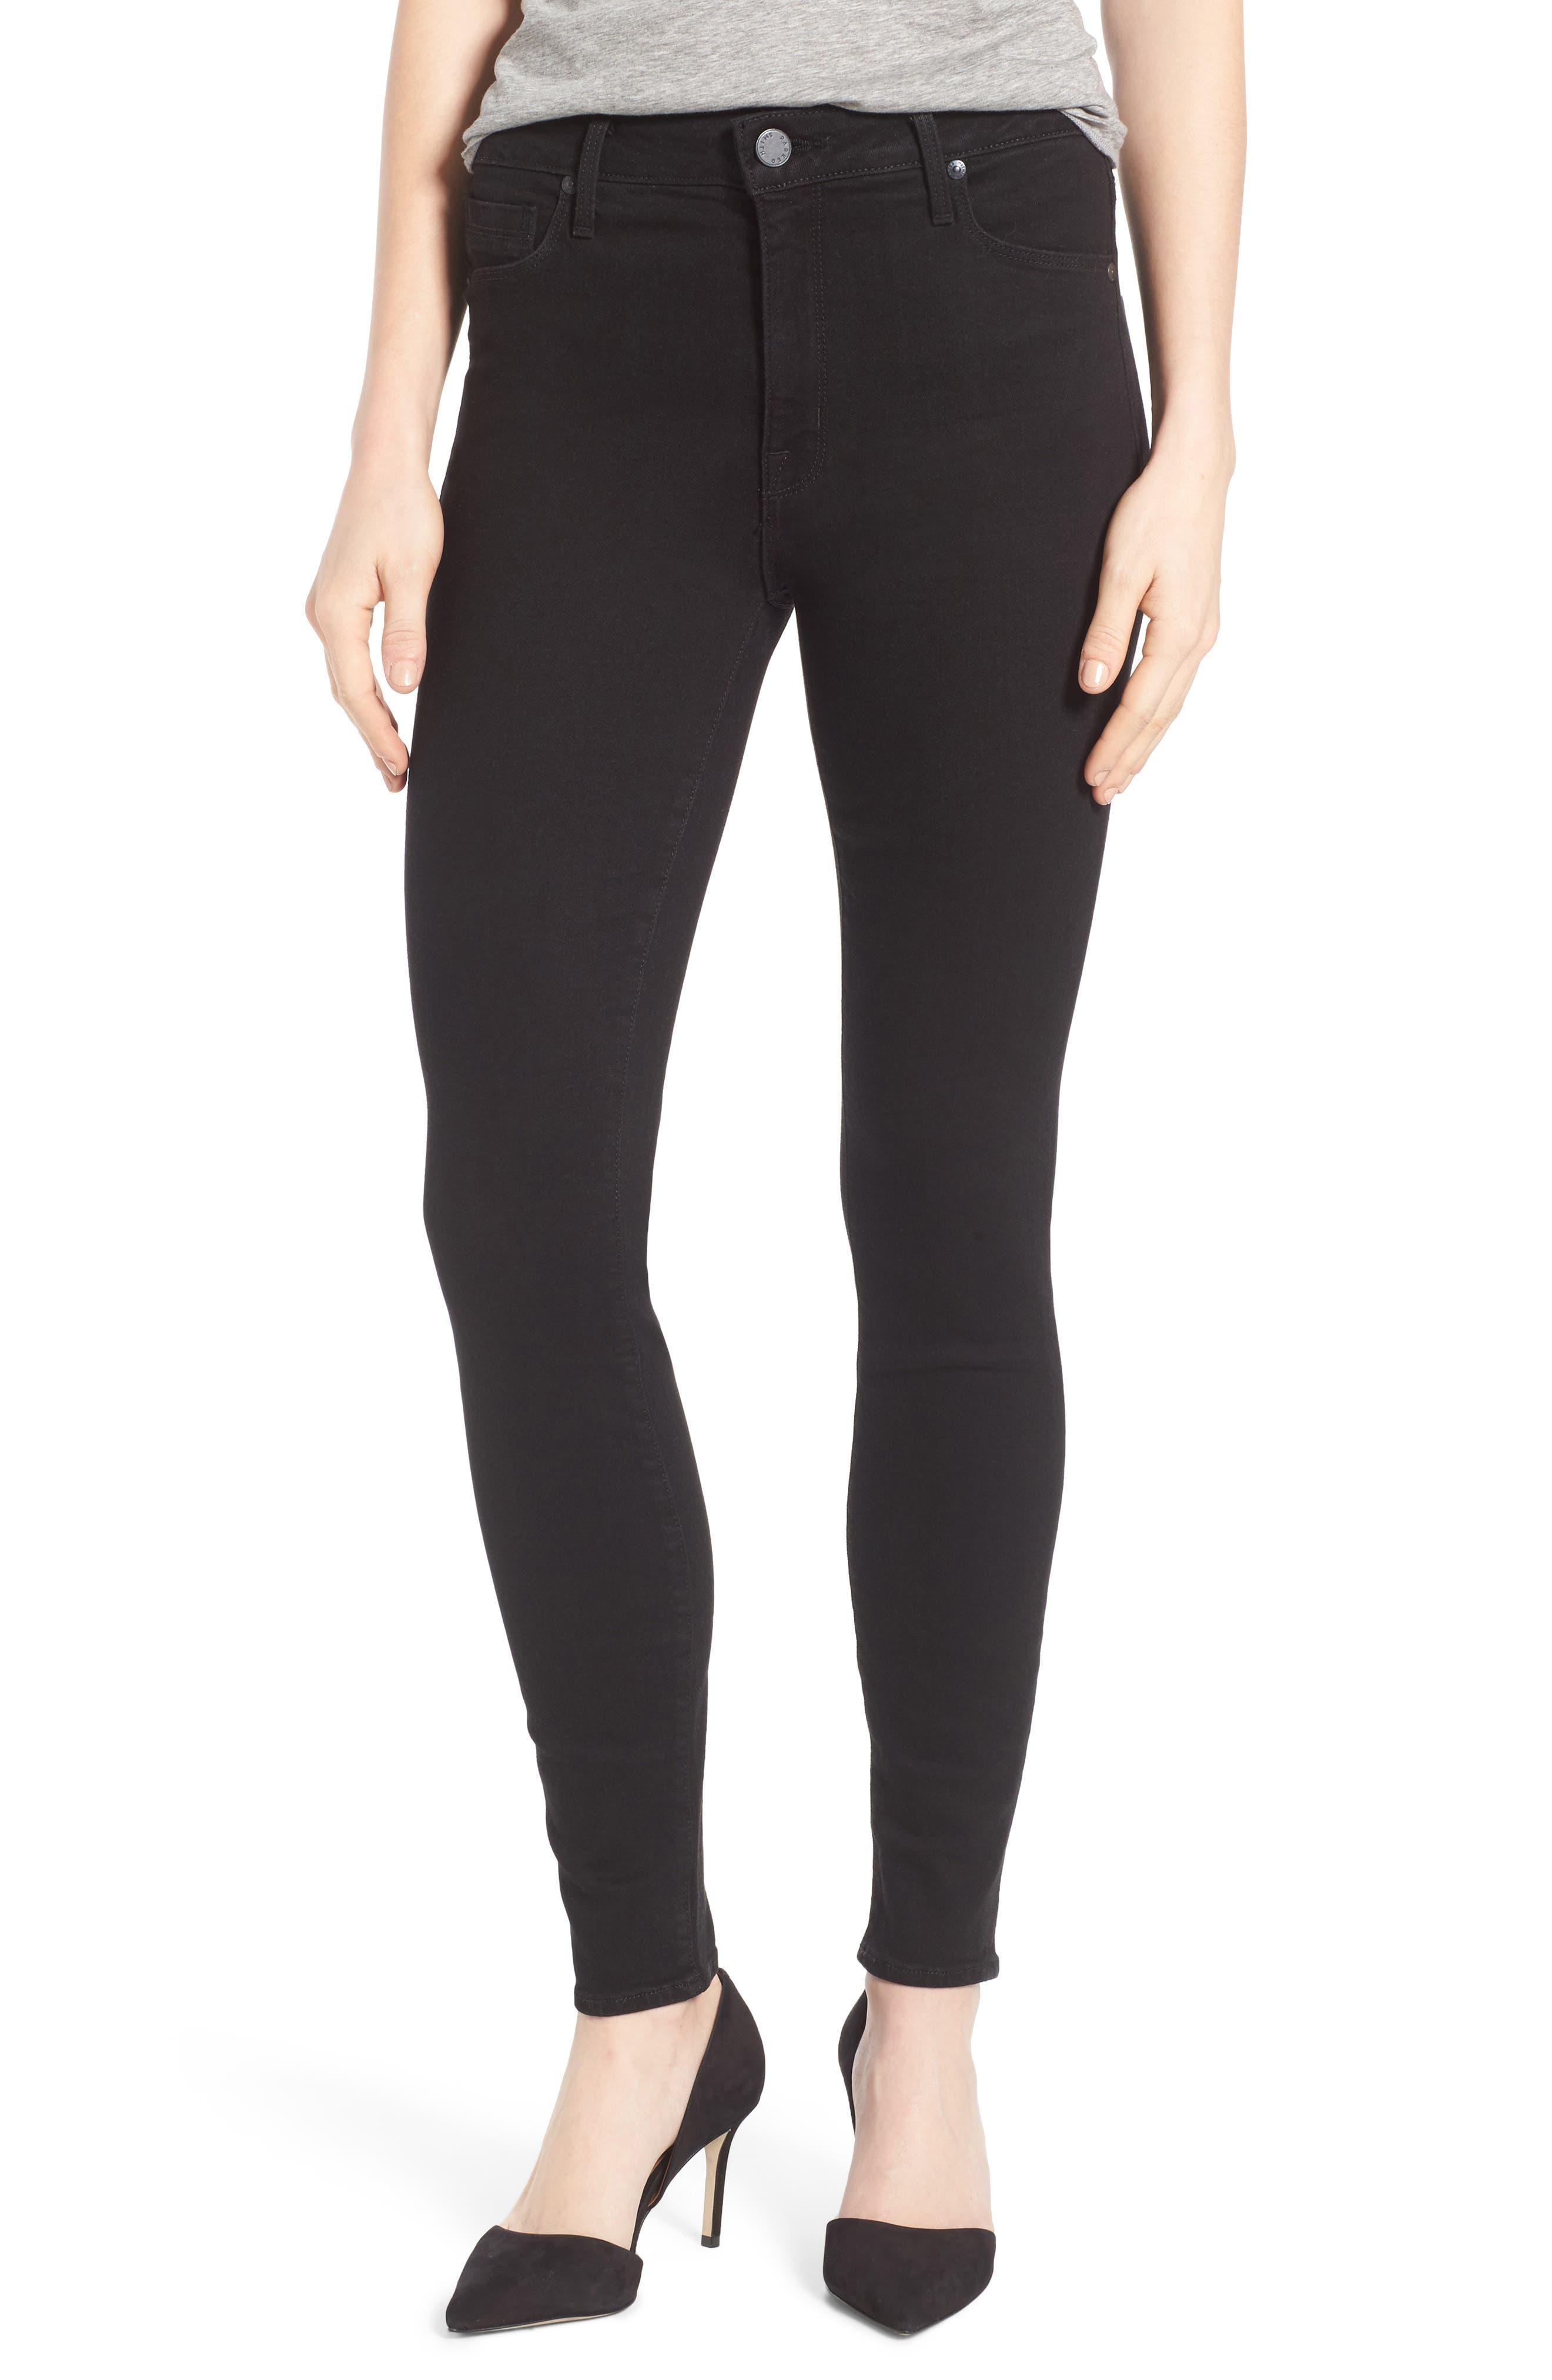 Main Image - PARKER SMITH Bombshell High Waist Stretch Skinny Jeans (Stallion)